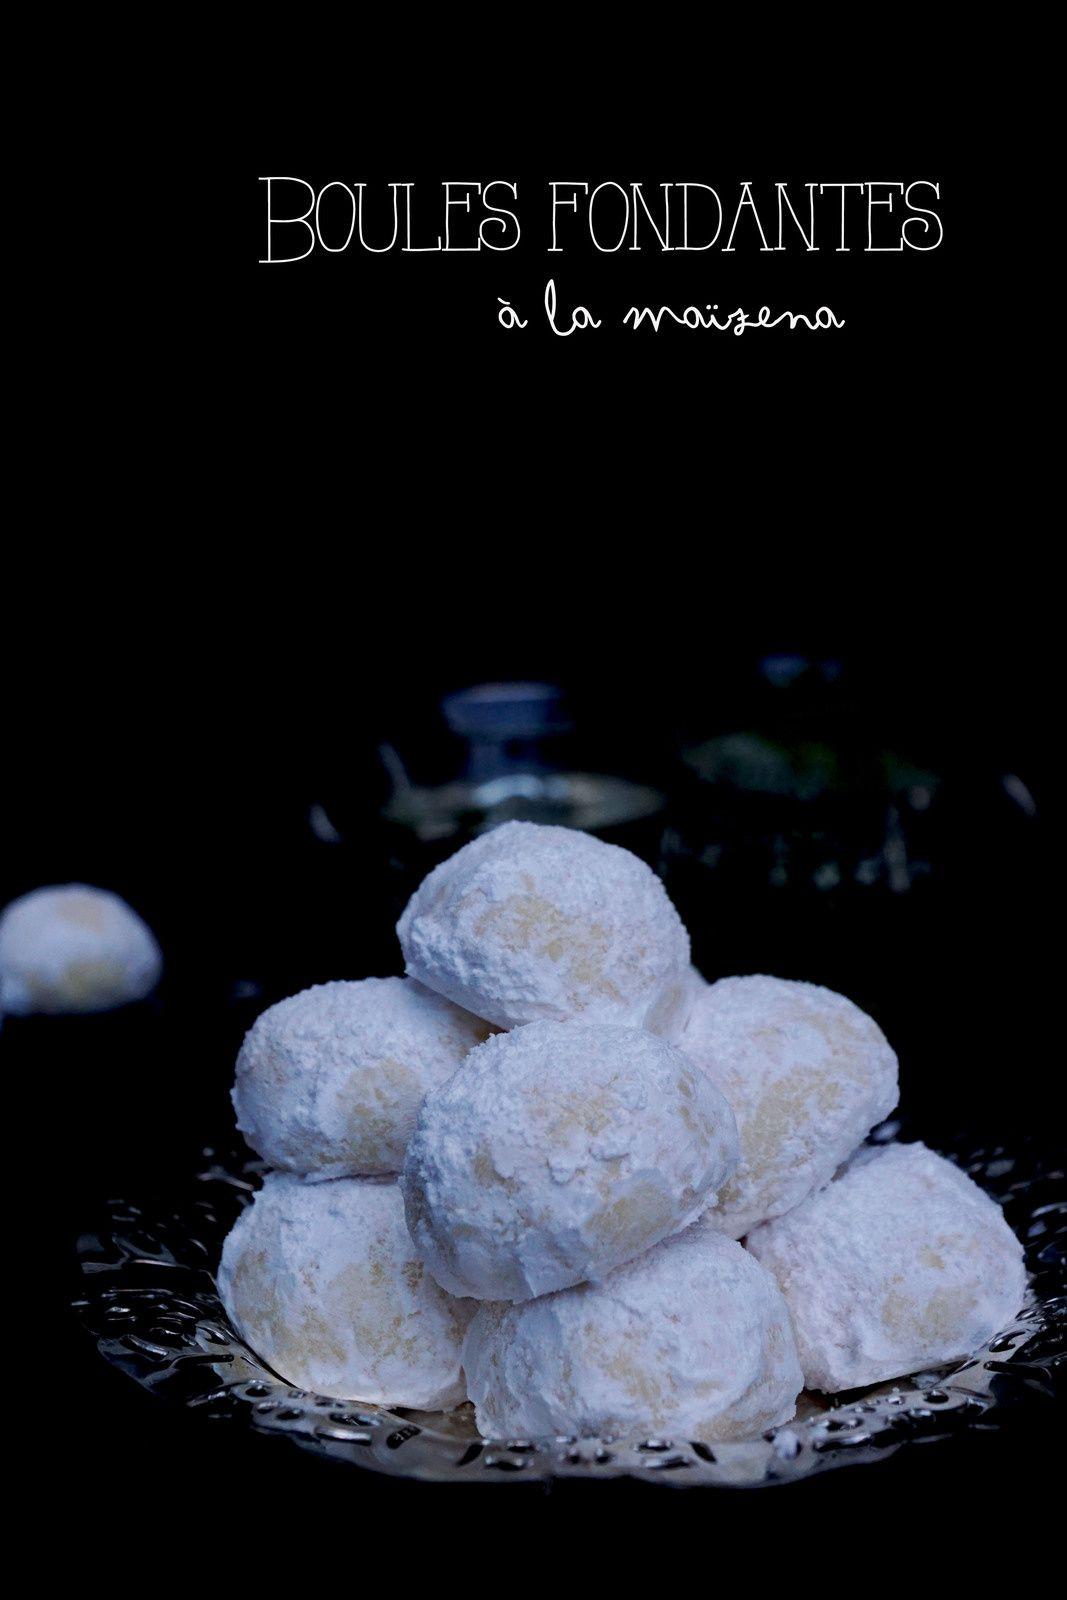 Boules fondantes à la maïzena